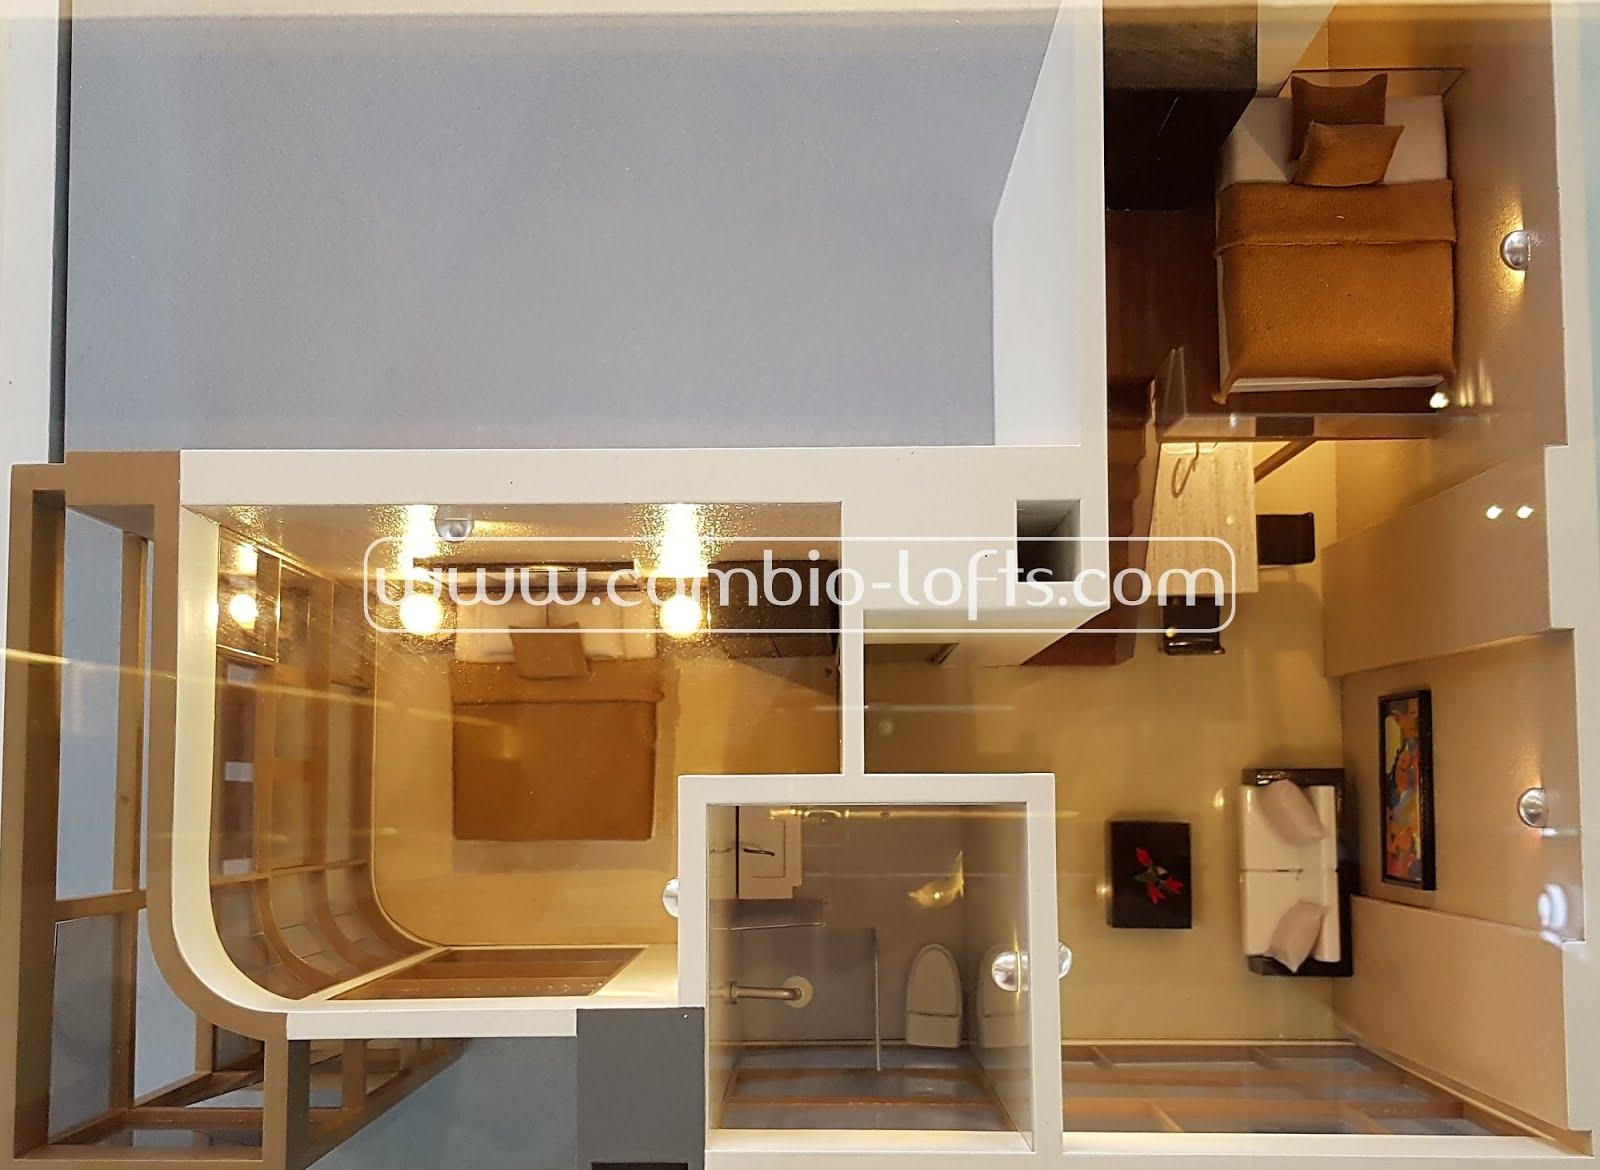 2 bedroom loft. Cambio Lofts - 2 Bedroom Loft E